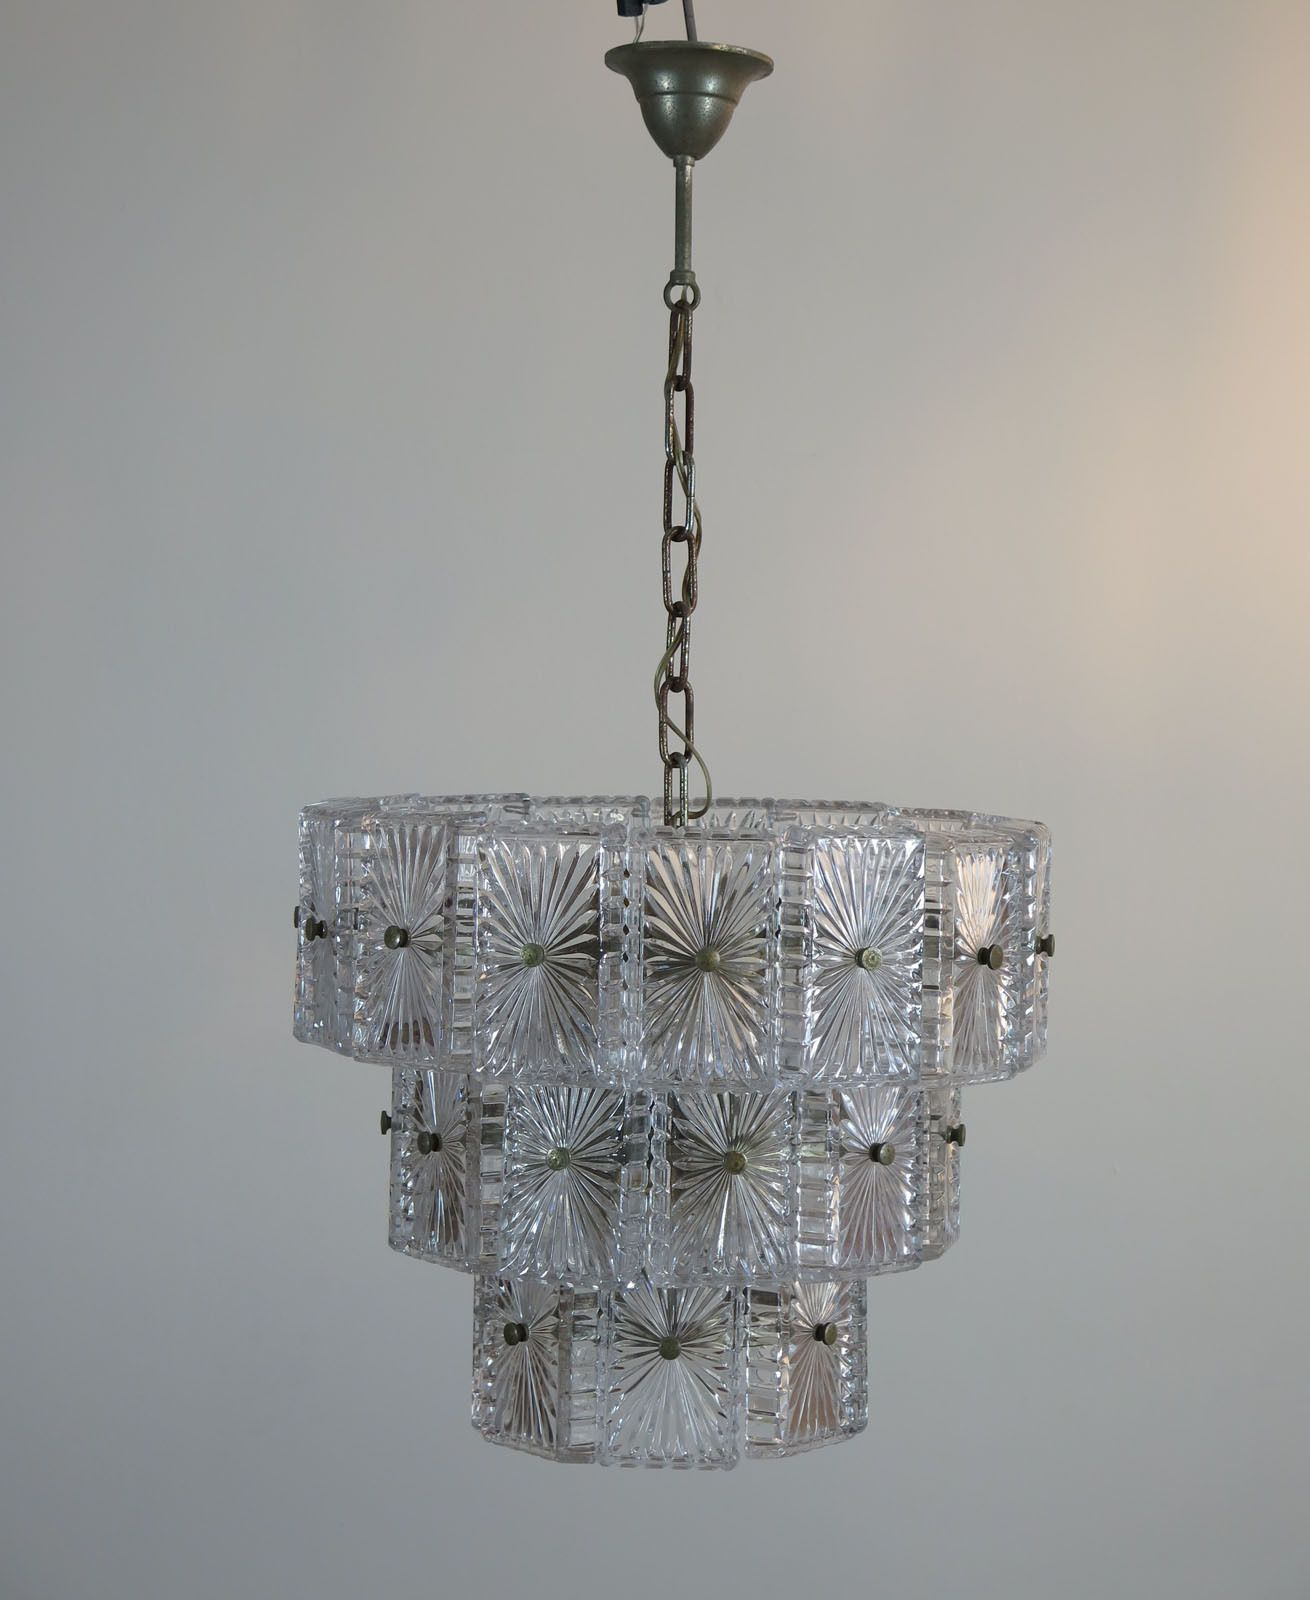 Vintage mid century italian glass chandelier murano ebay vintage mid century italian glass chandelier murano ebay arubaitofo Choice Image